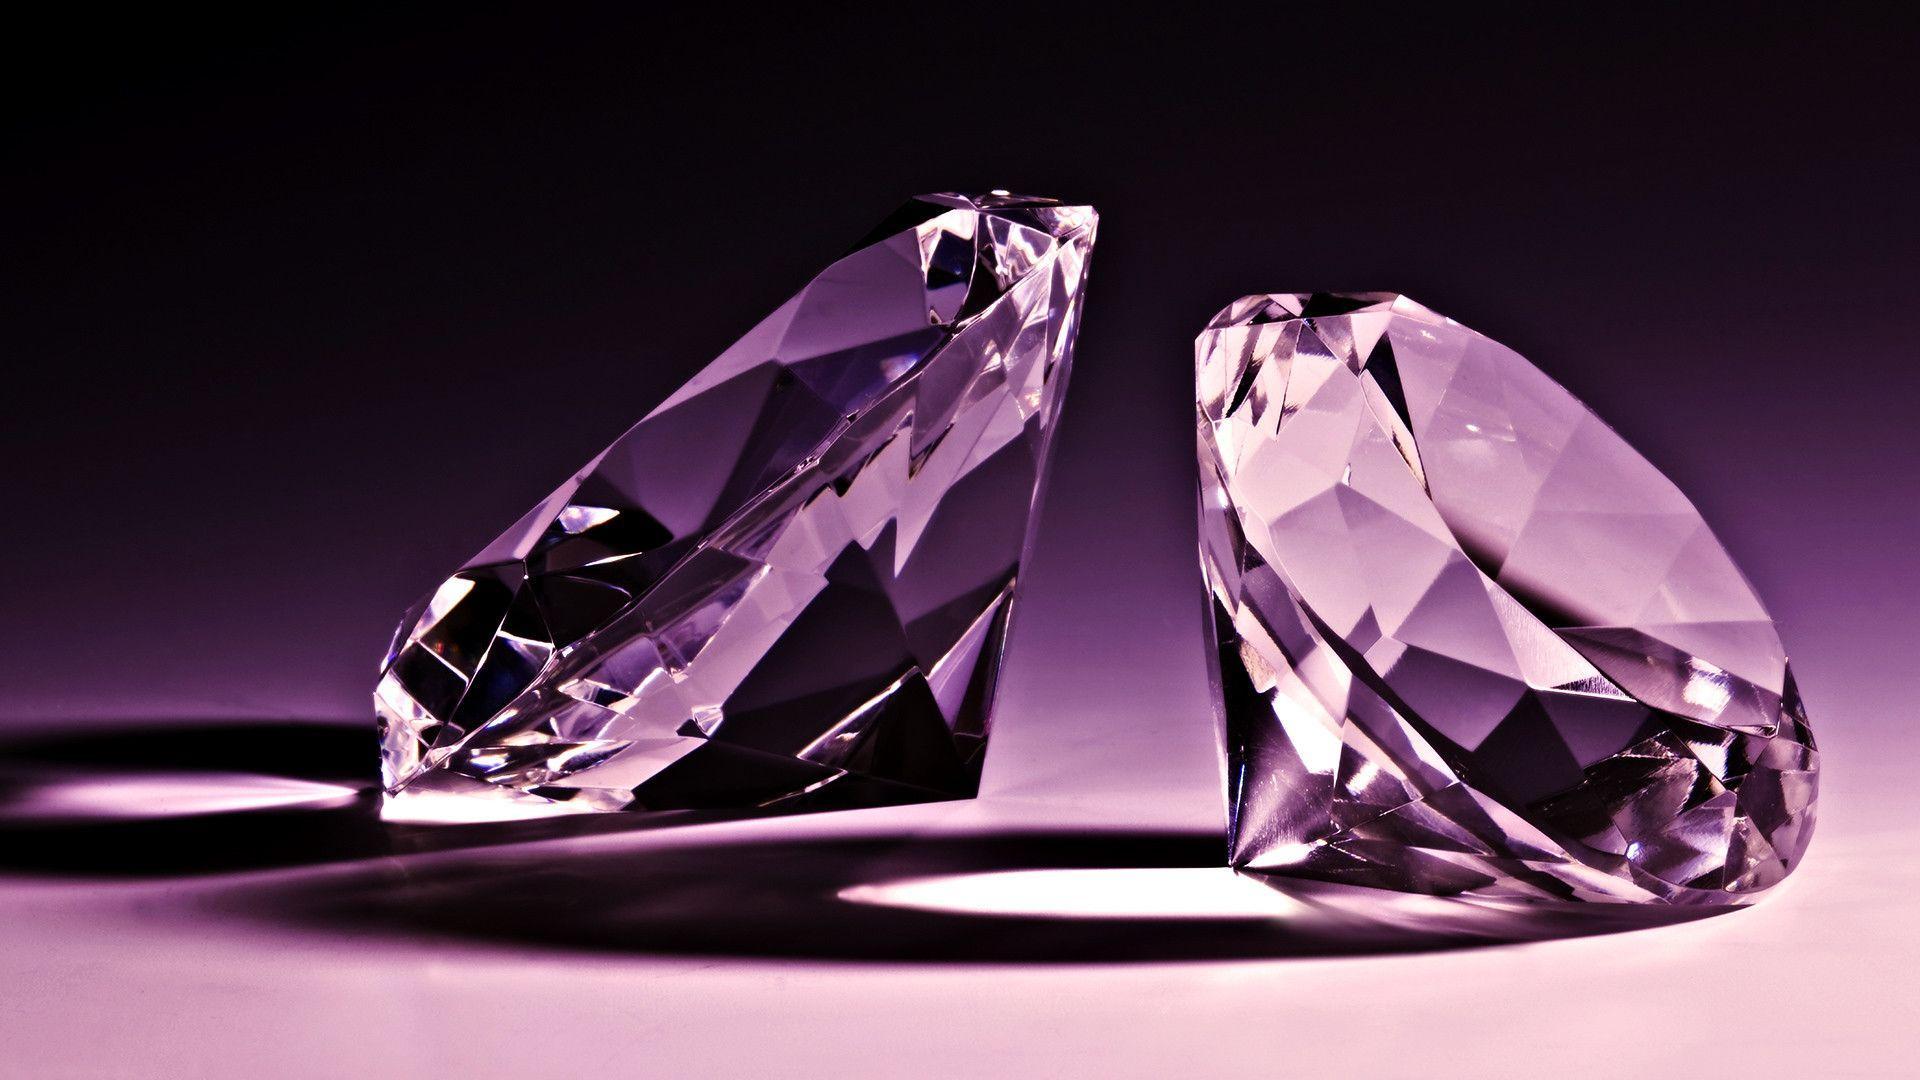 Diamonds Wallpapers Top Free Diamonds Backgrounds Wallpaperaccess